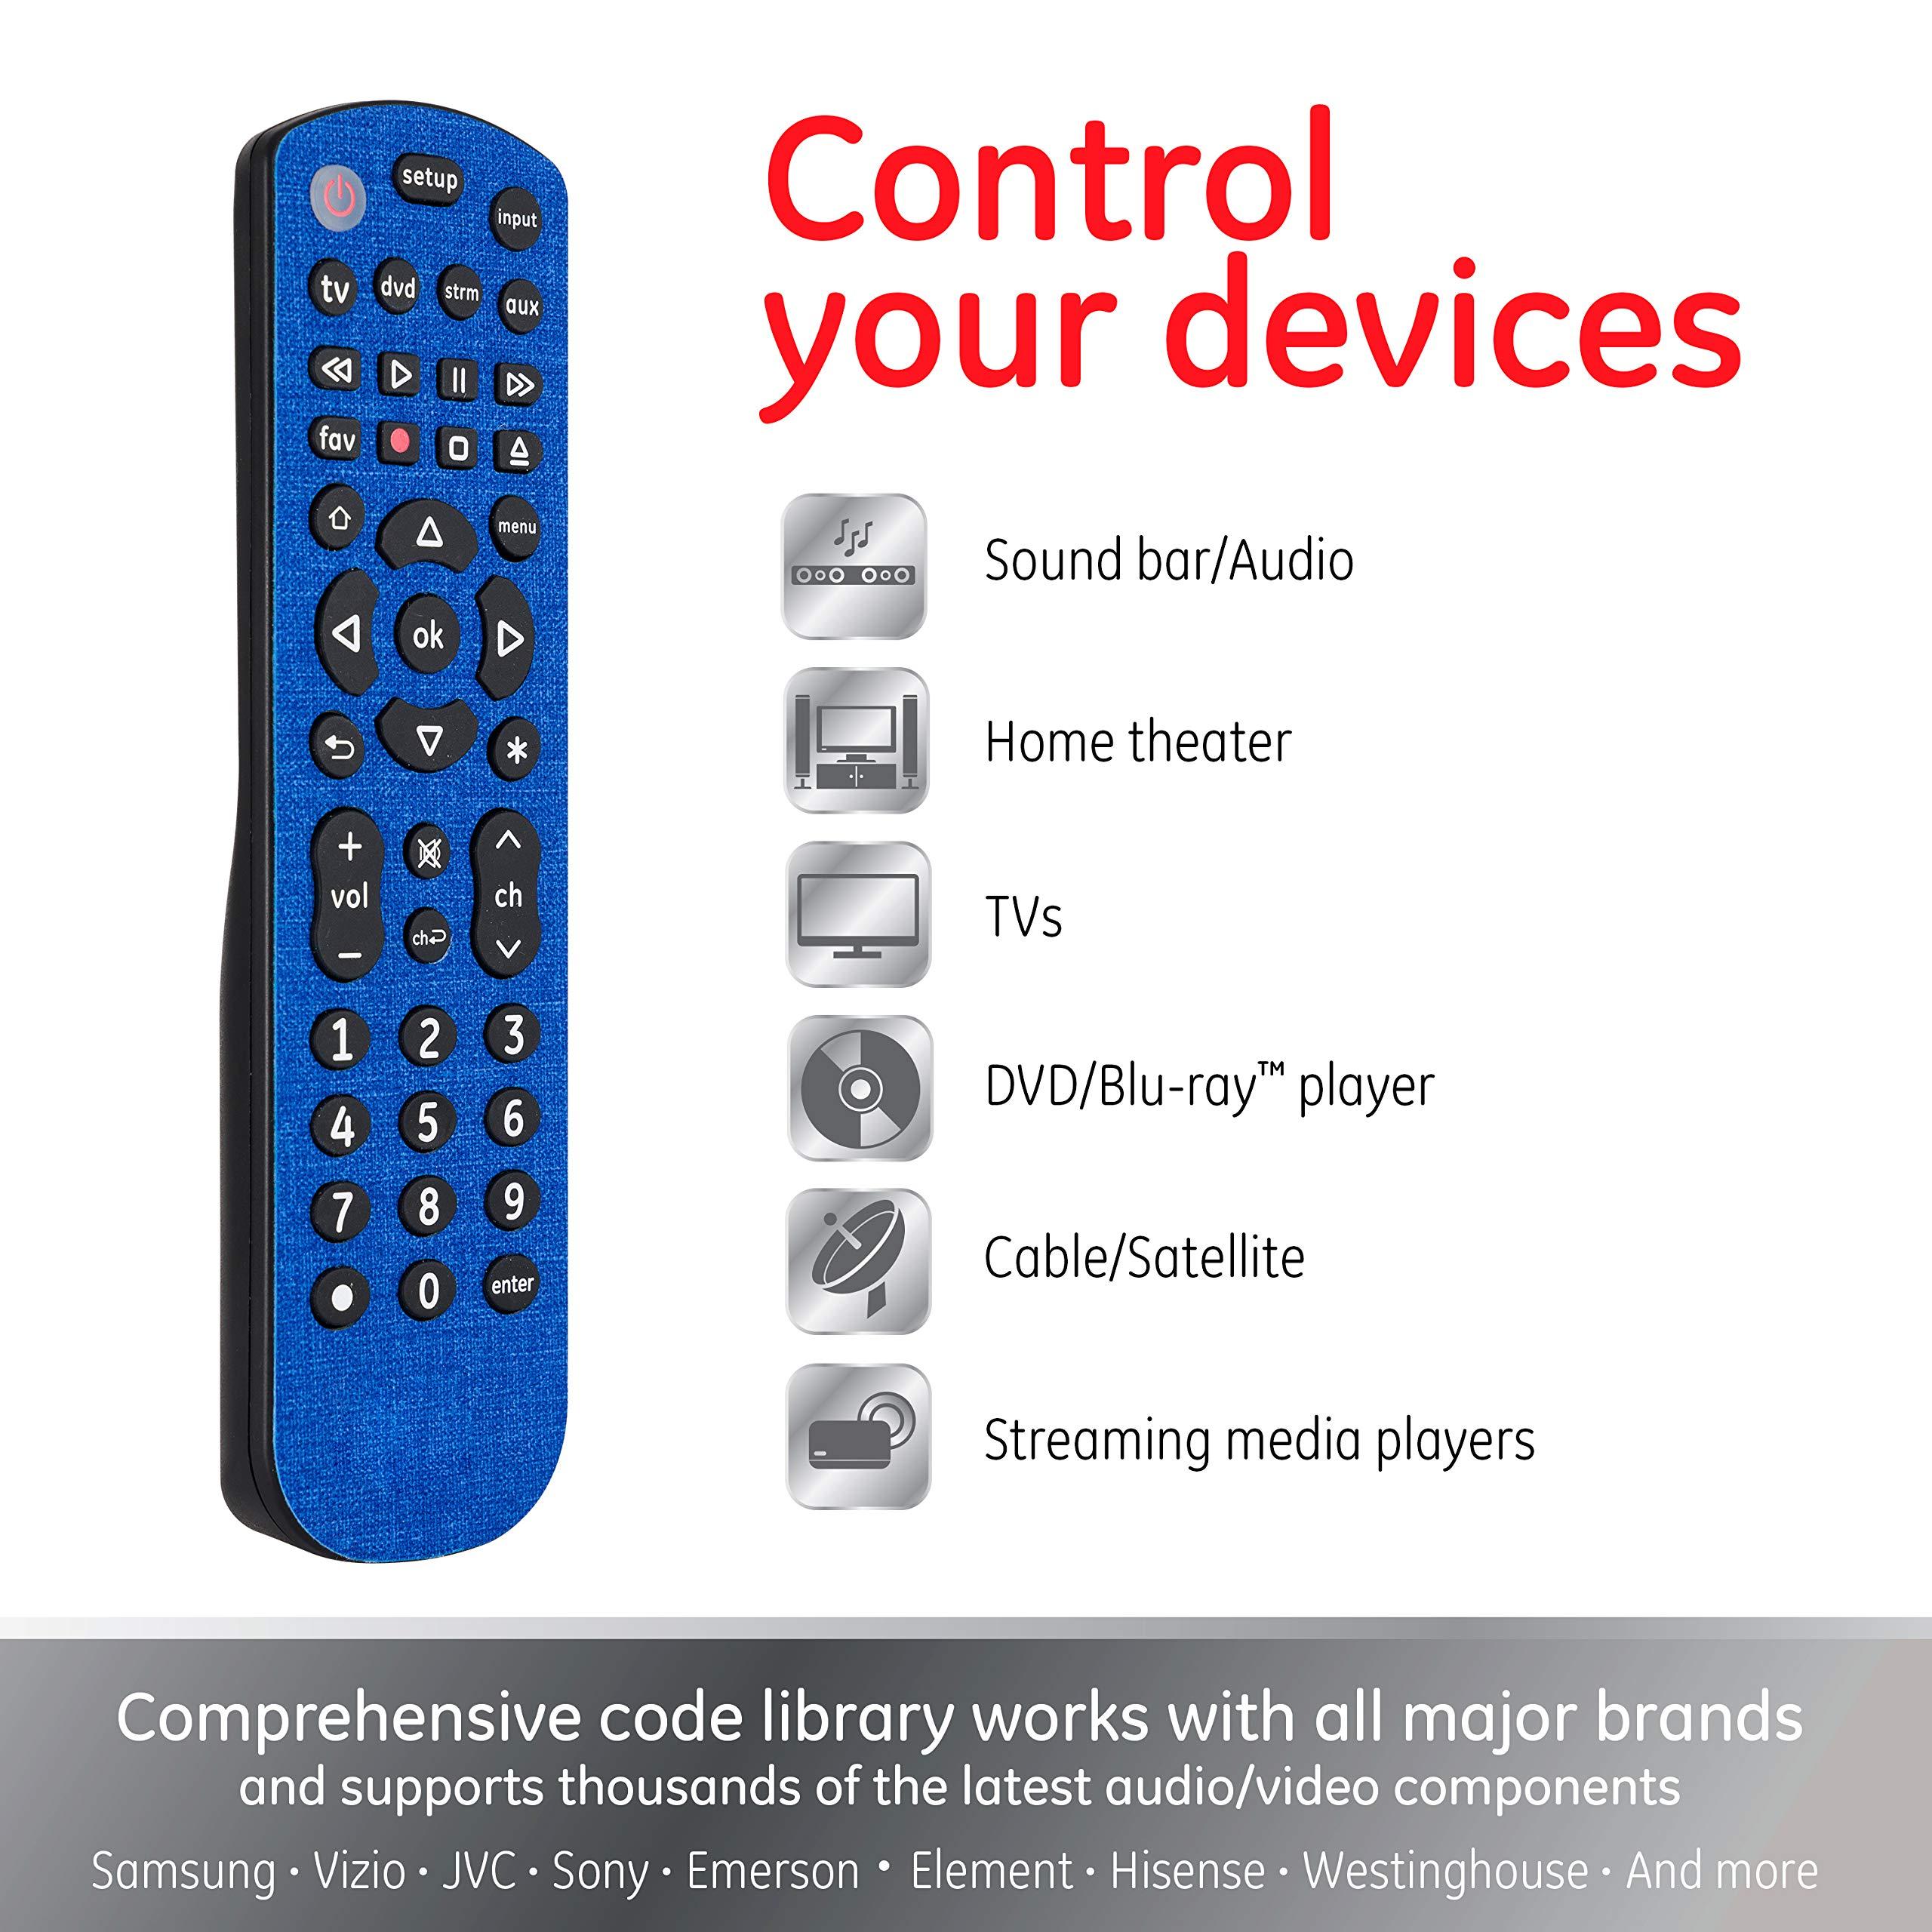 Amazon Com Ge Universal Remote For Samsung Vizio Lg Sony Sharp Roku Apple Tv Rca Panasonic Smart Tvs Streaming Players Blu Ray Dvd 4 Device Blue 46577 Cobalt Blue Electronics